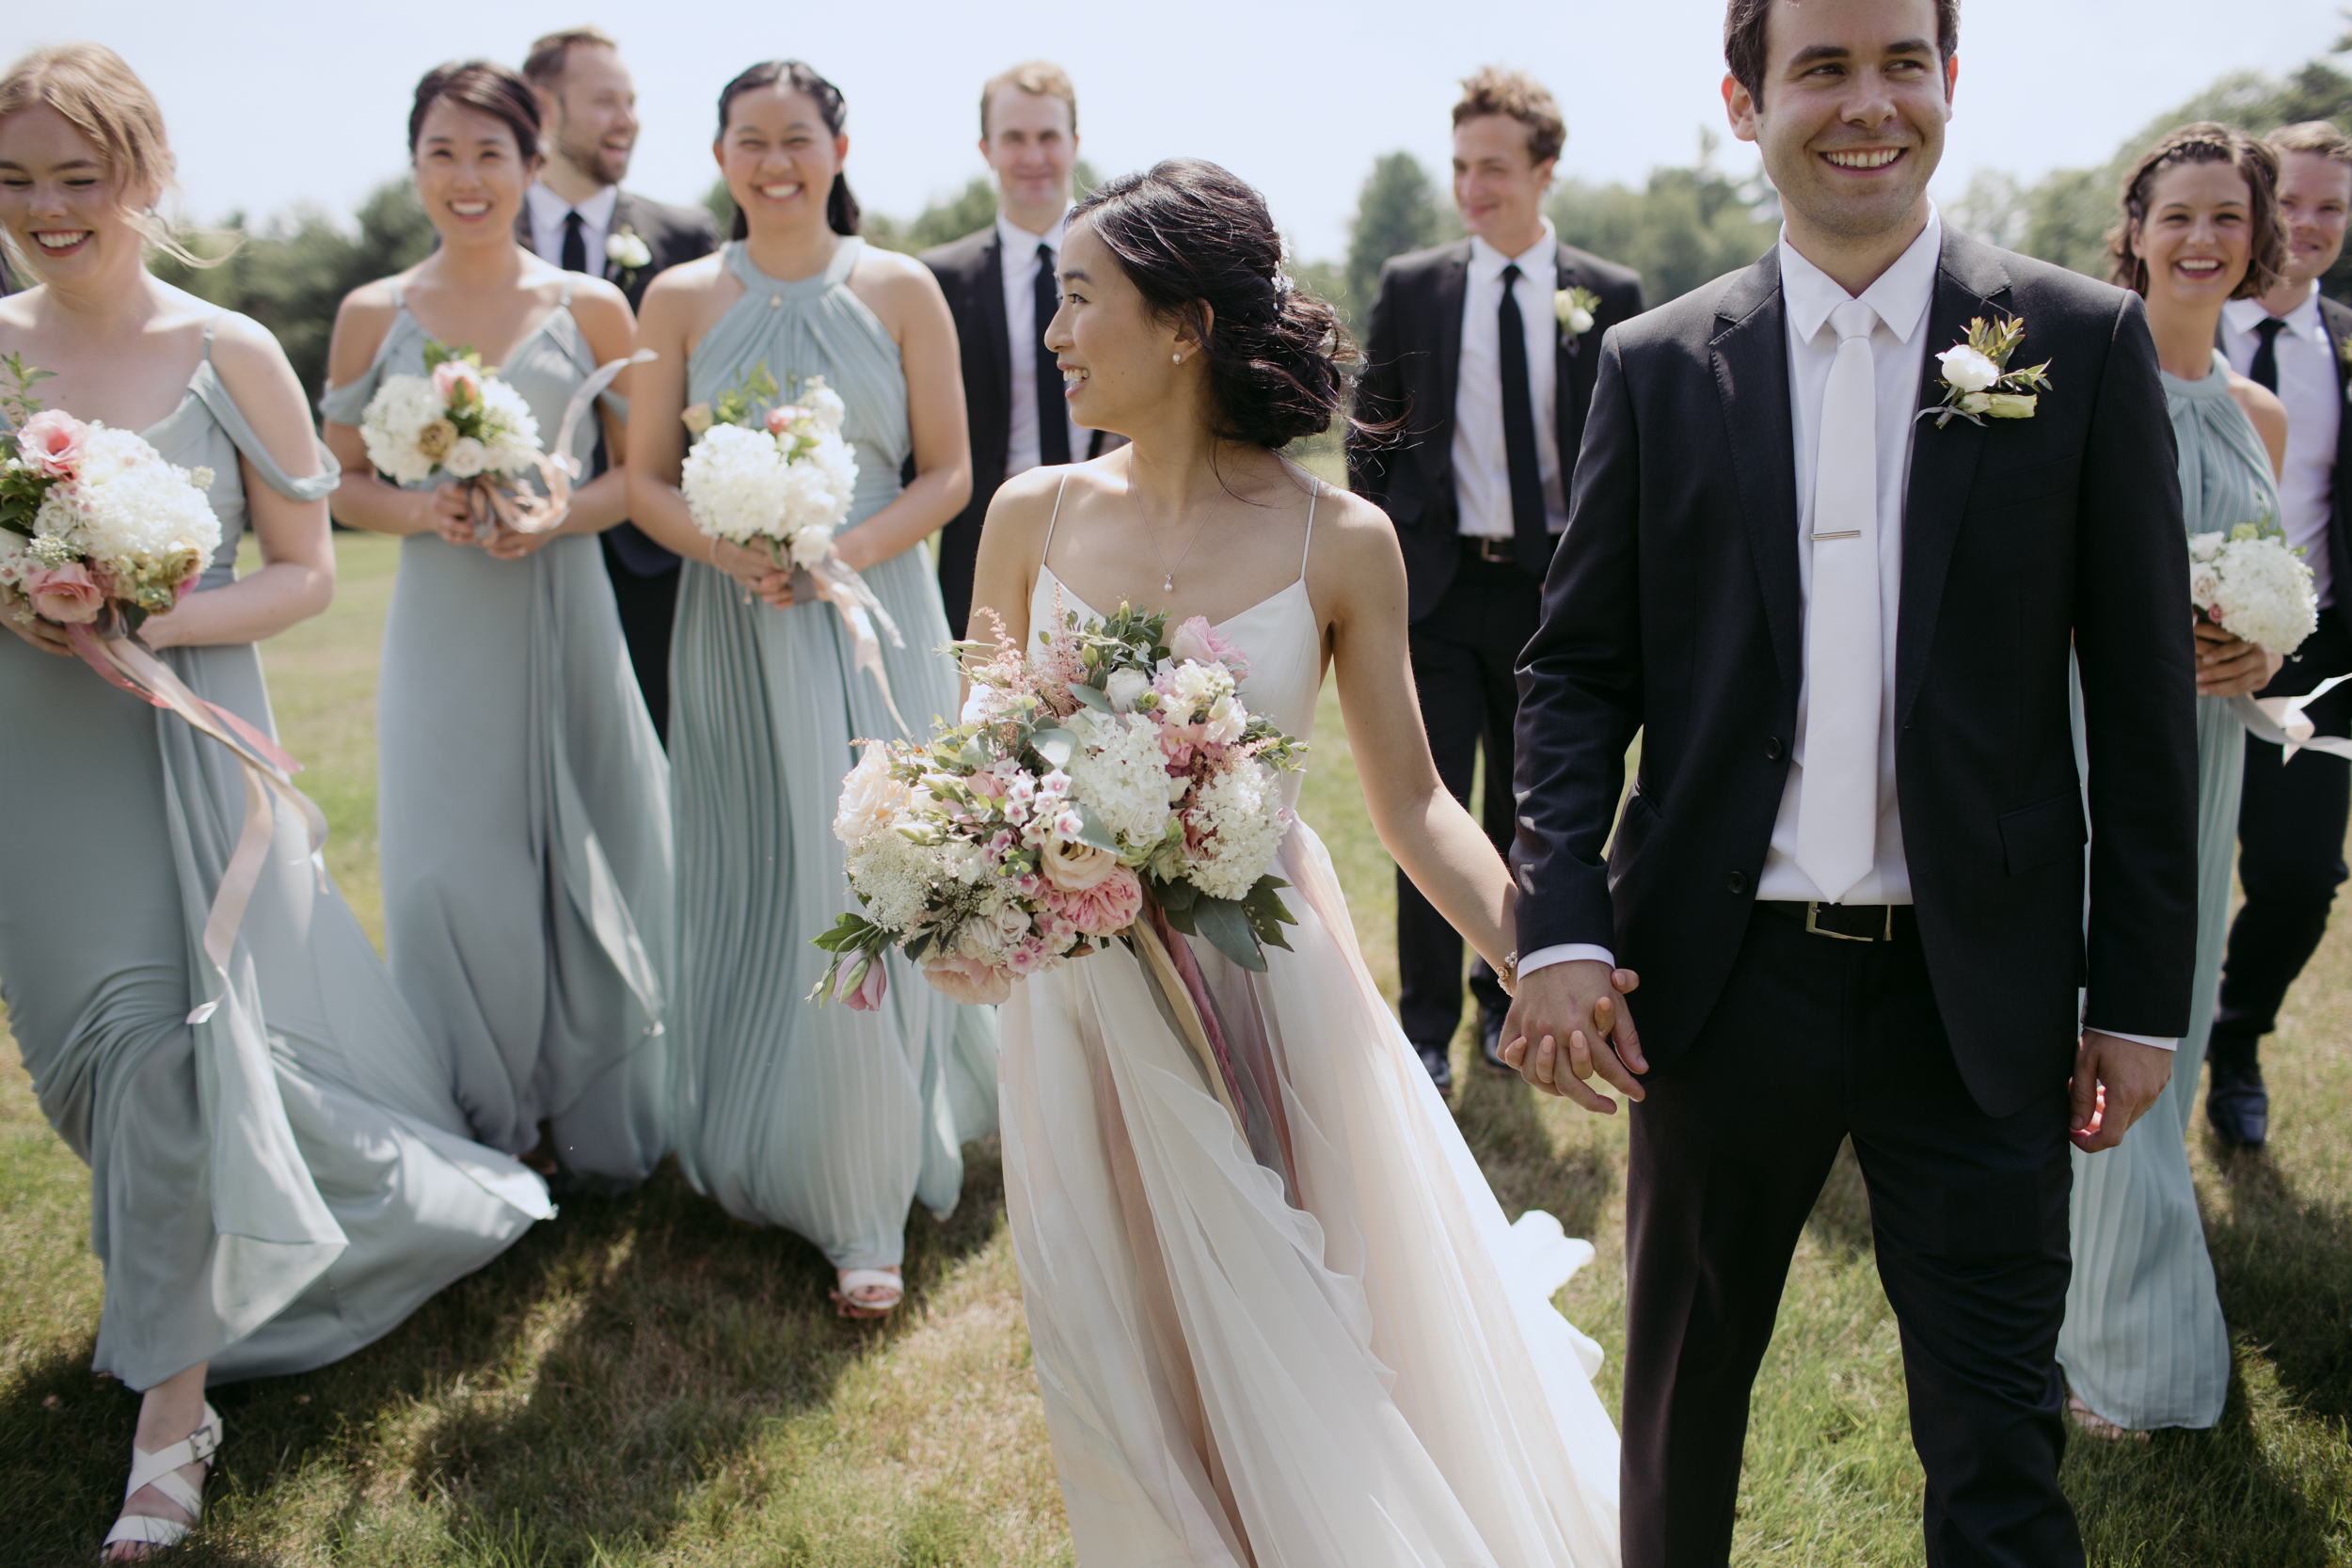 william_allen_farm_wedding_pownal_maine_ilkatayler-13.jpg